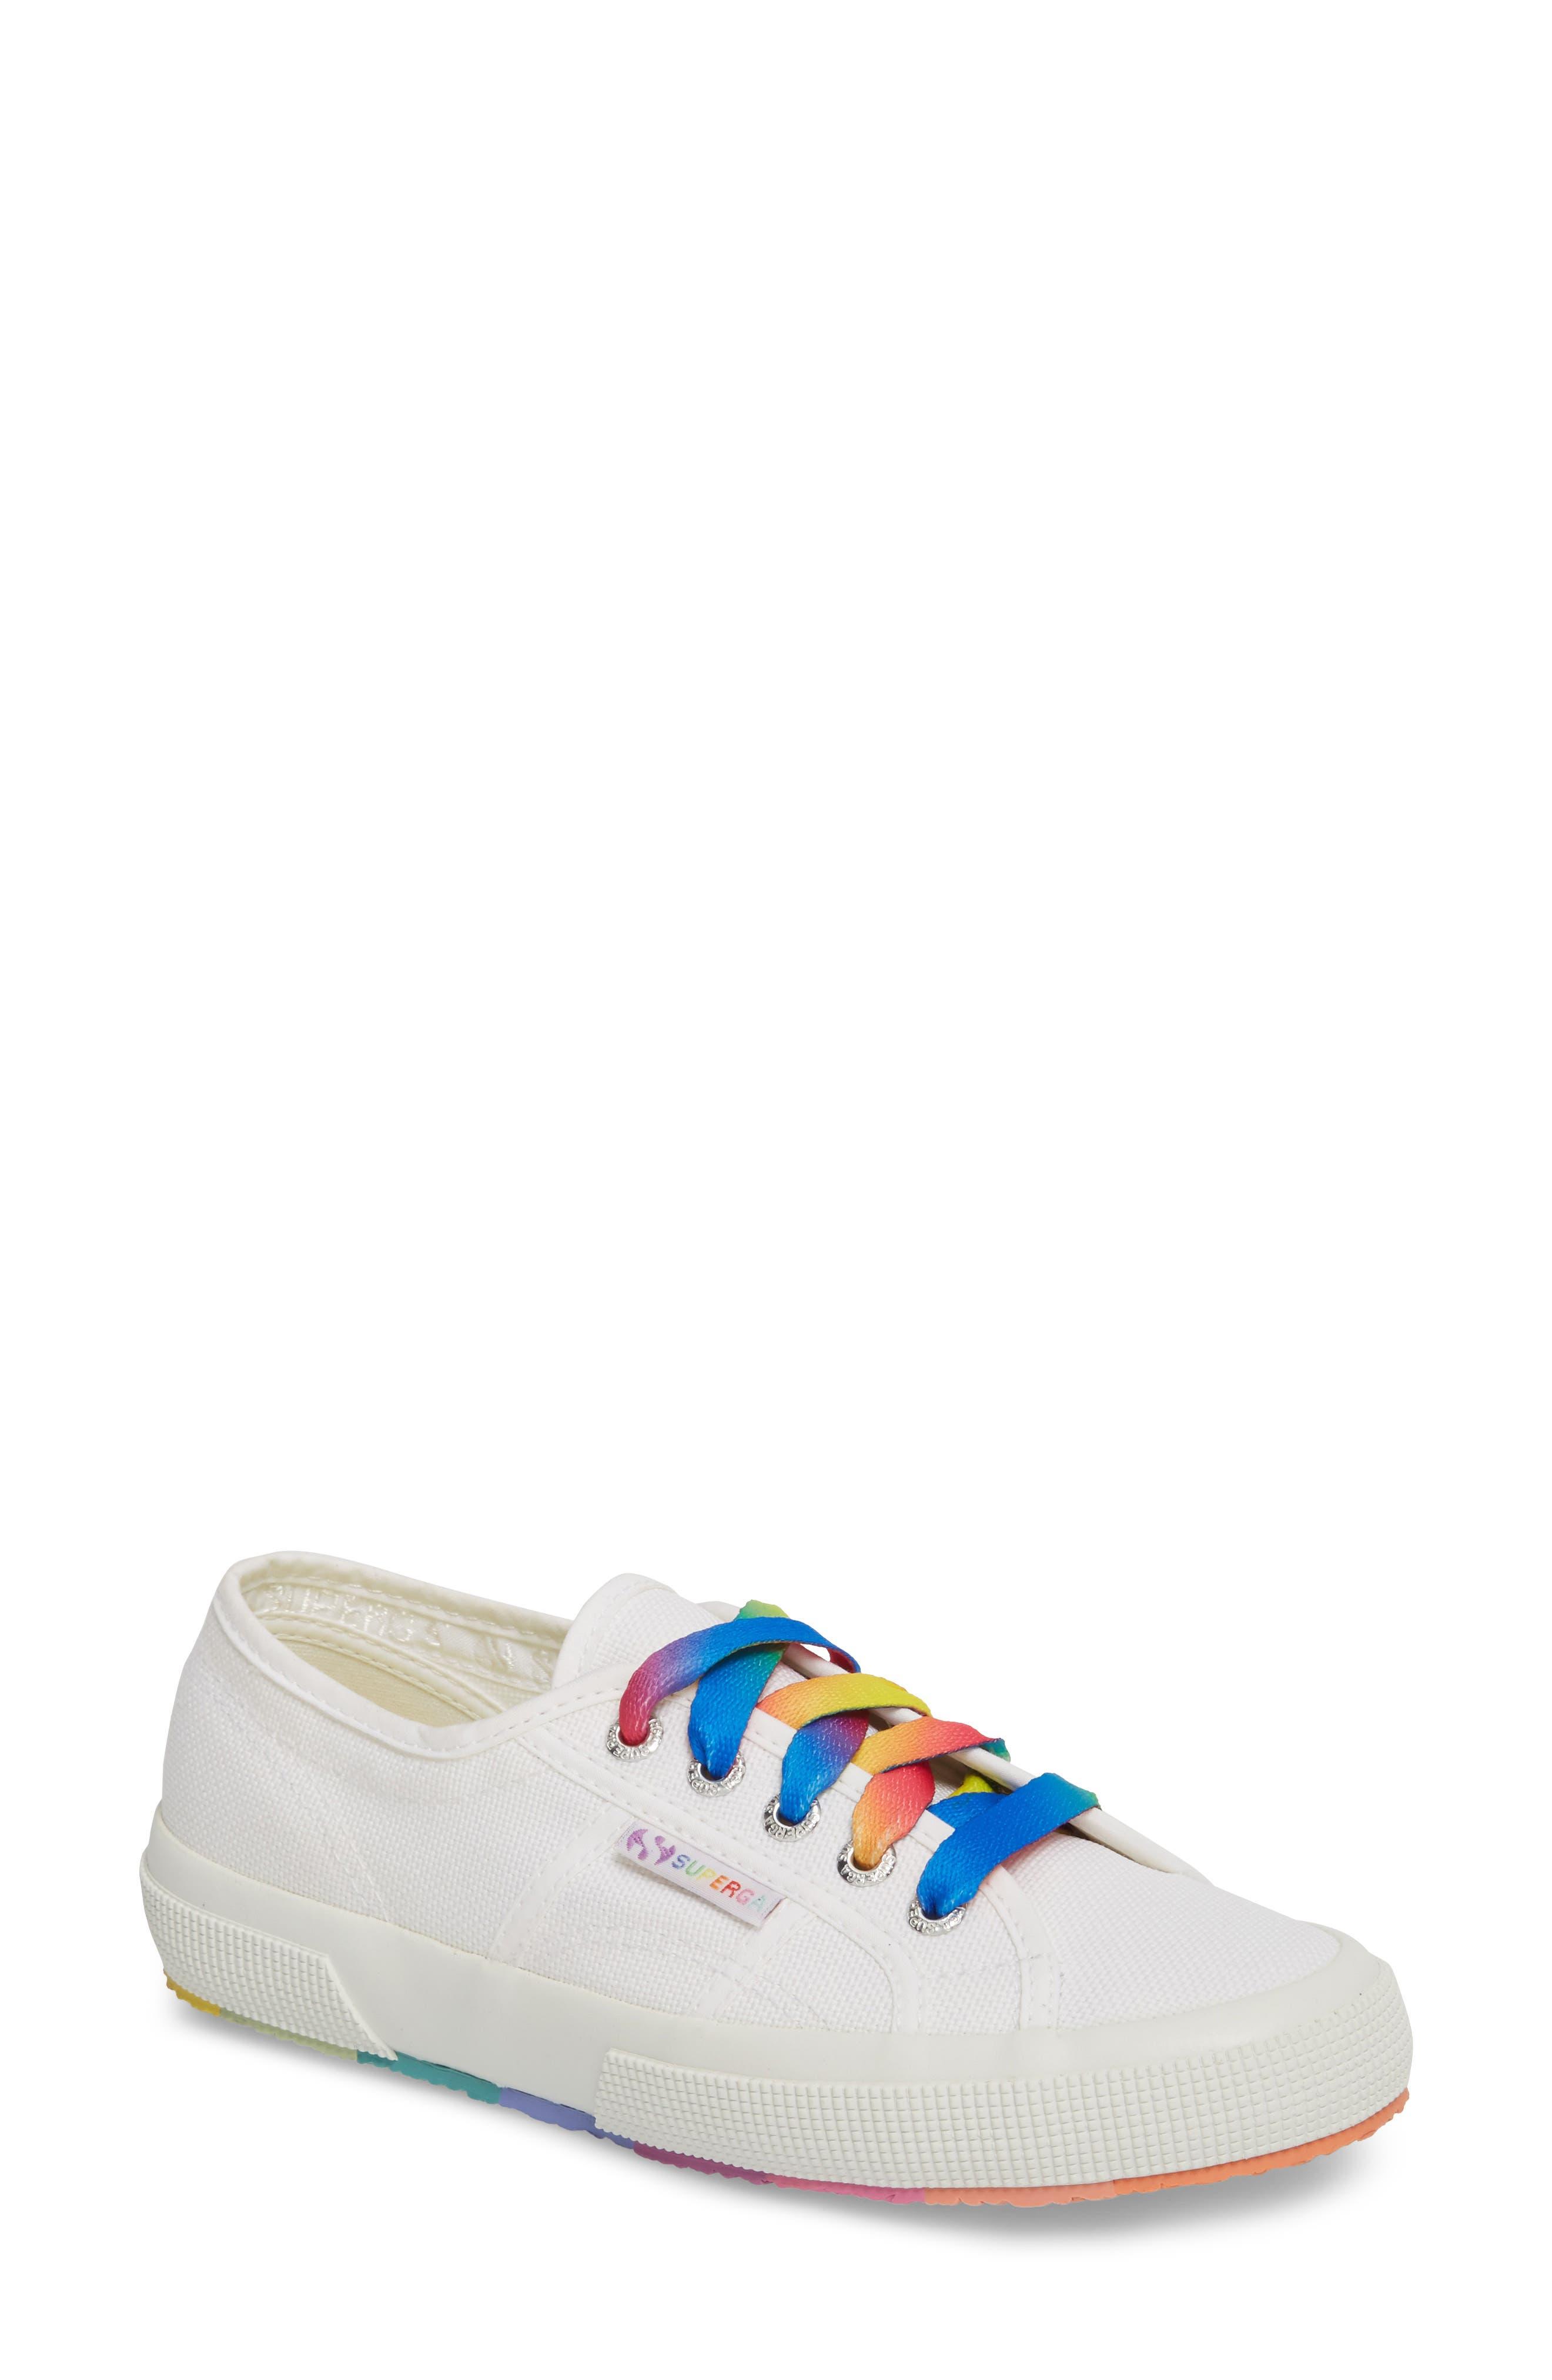 2750 Multicolor Sneaker,                             Main thumbnail 1, color,